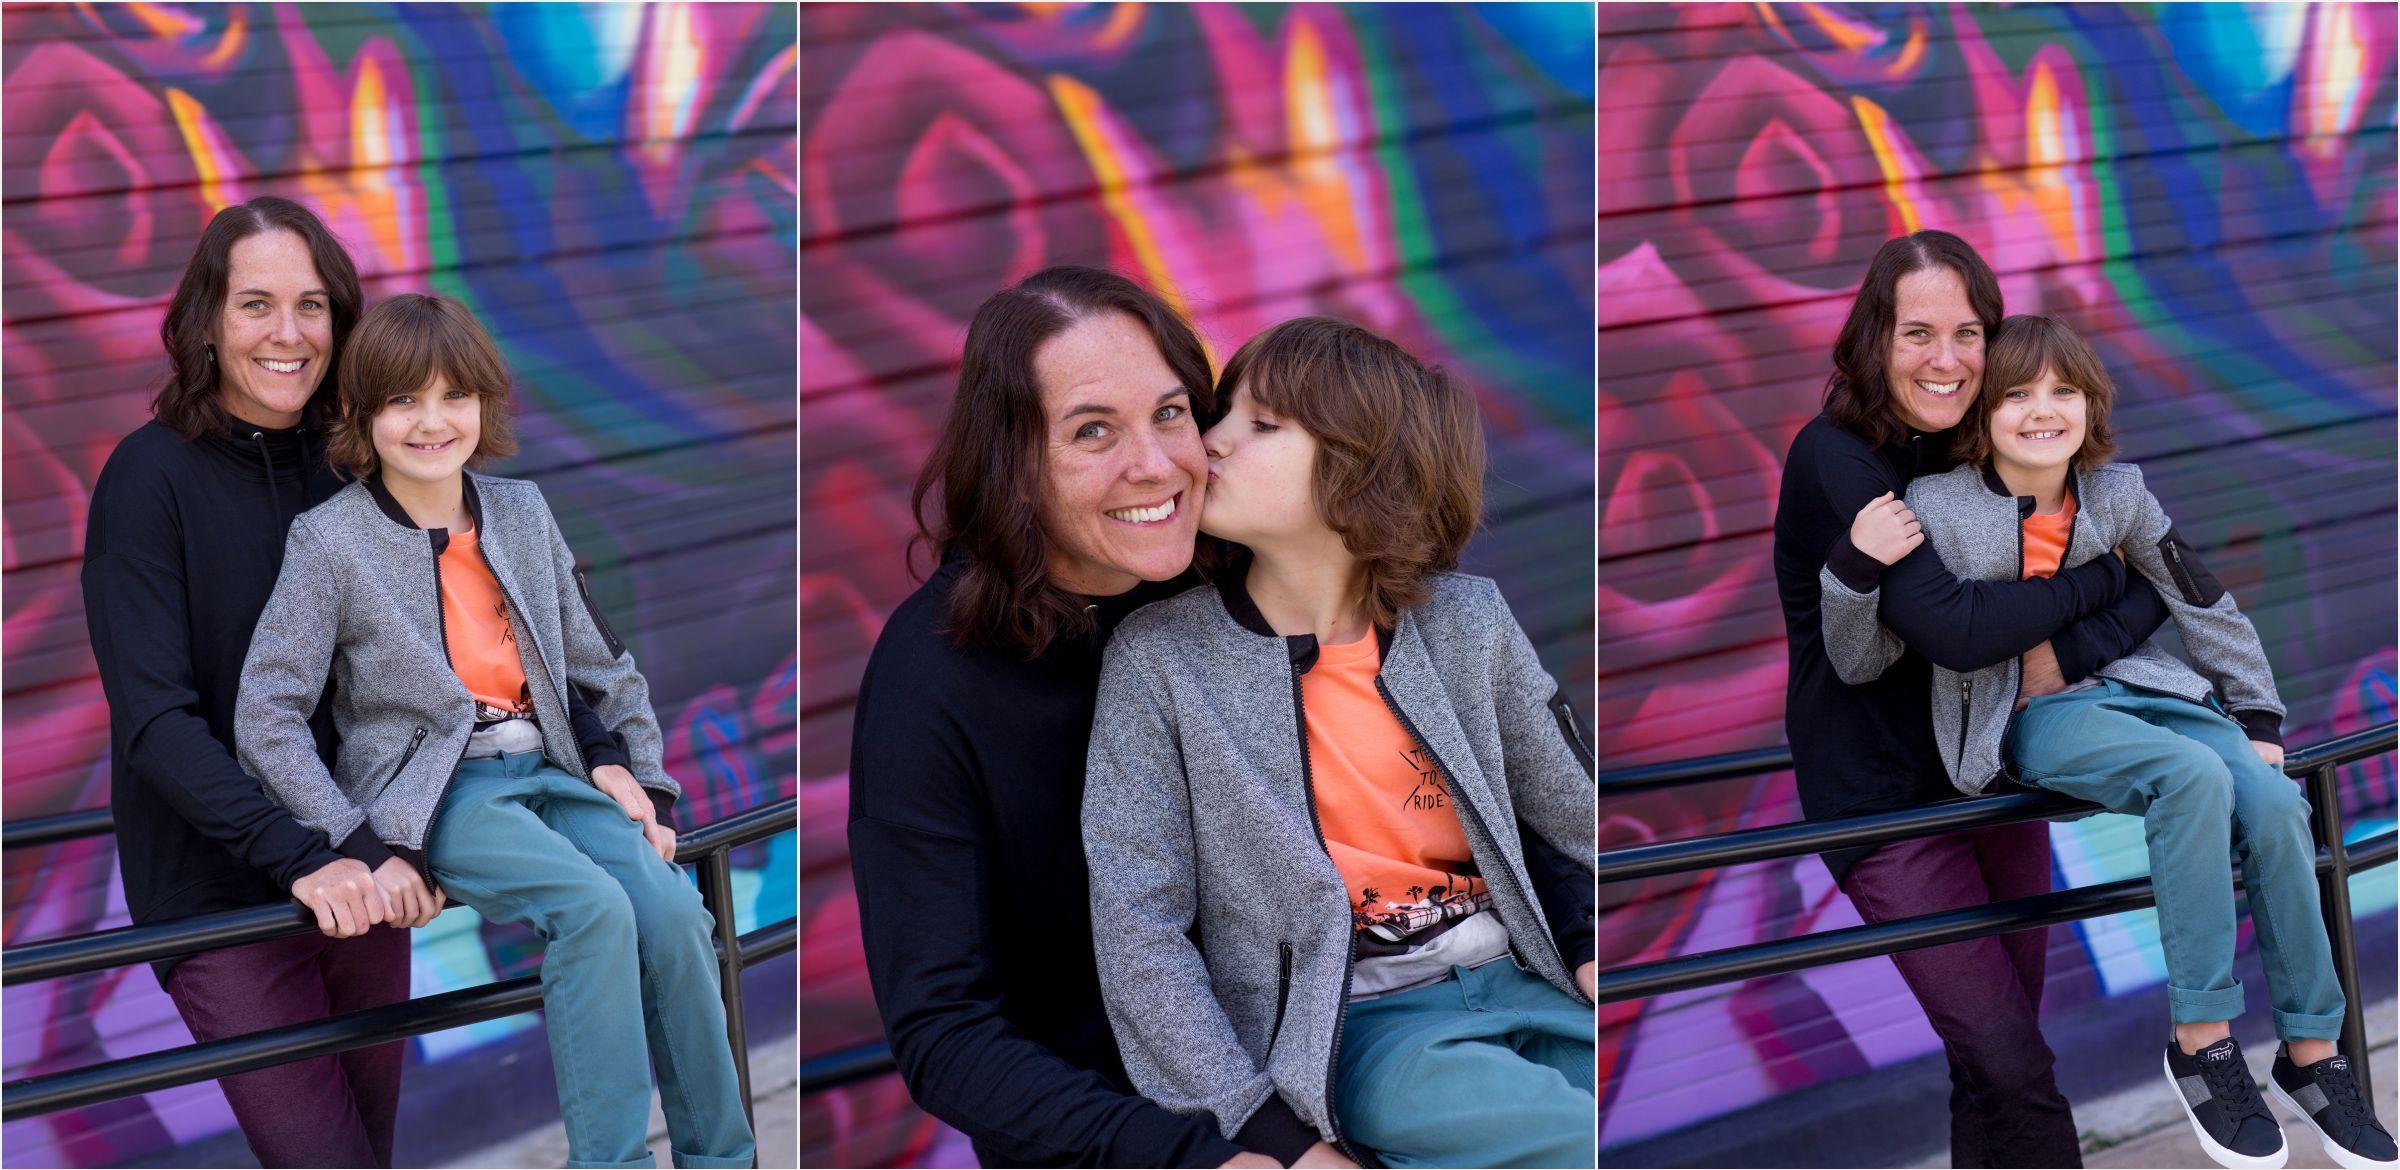 Denver-mommy-and-me-photo-shoot-in-denver-colorado-005